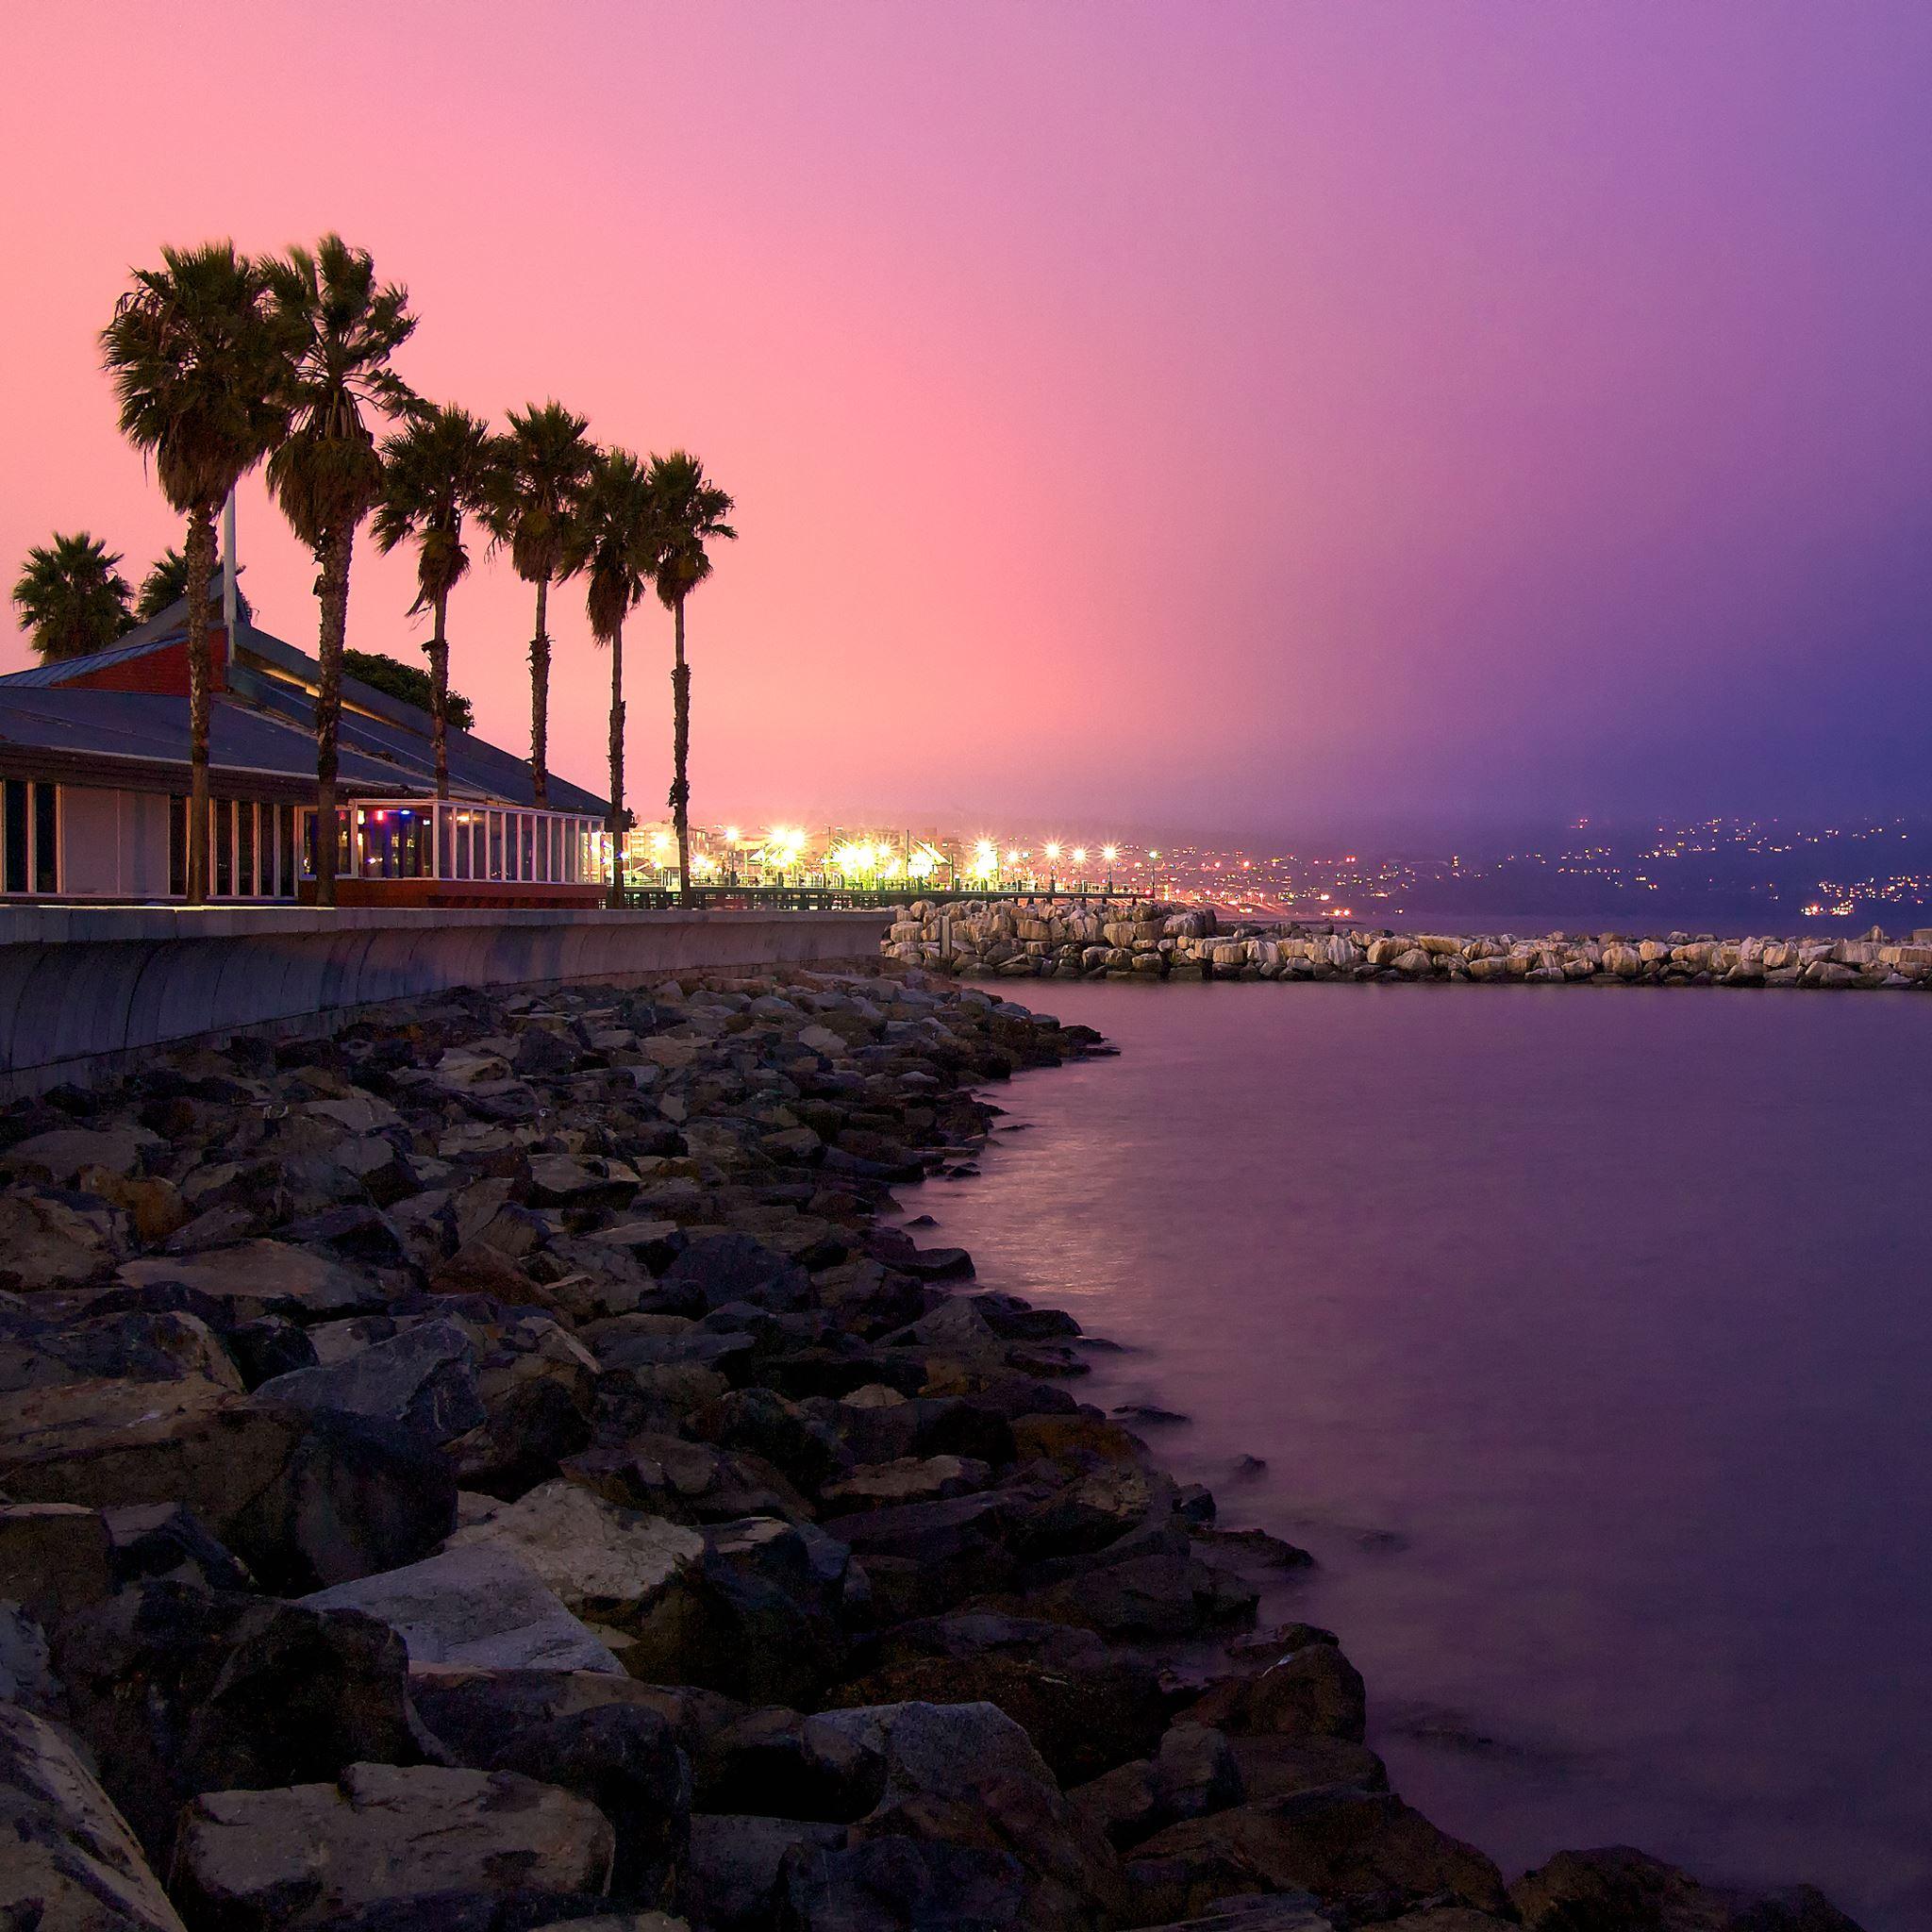 La Sunset Ipad Air Wallpapers Free Download